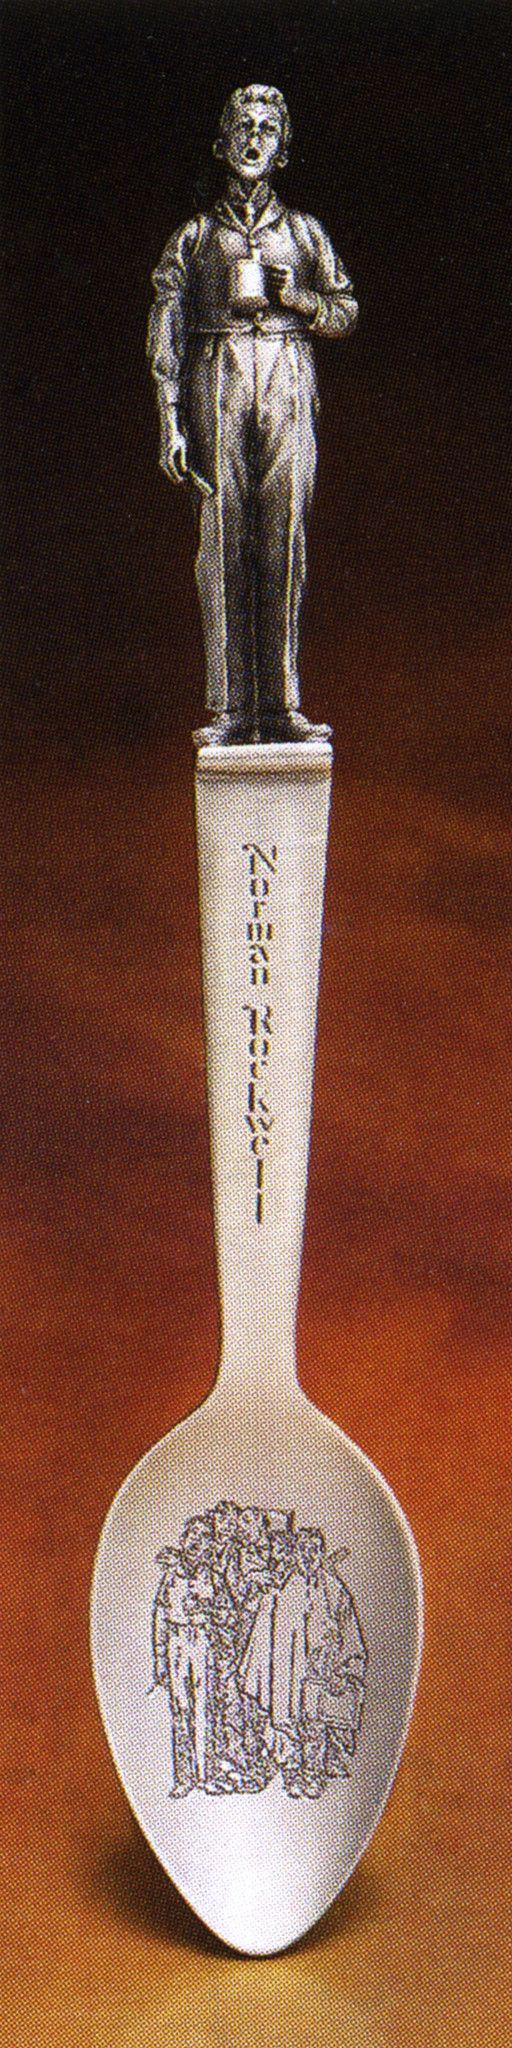 Barber Shop Quartet: Saturday Evening Post September 26, 1936